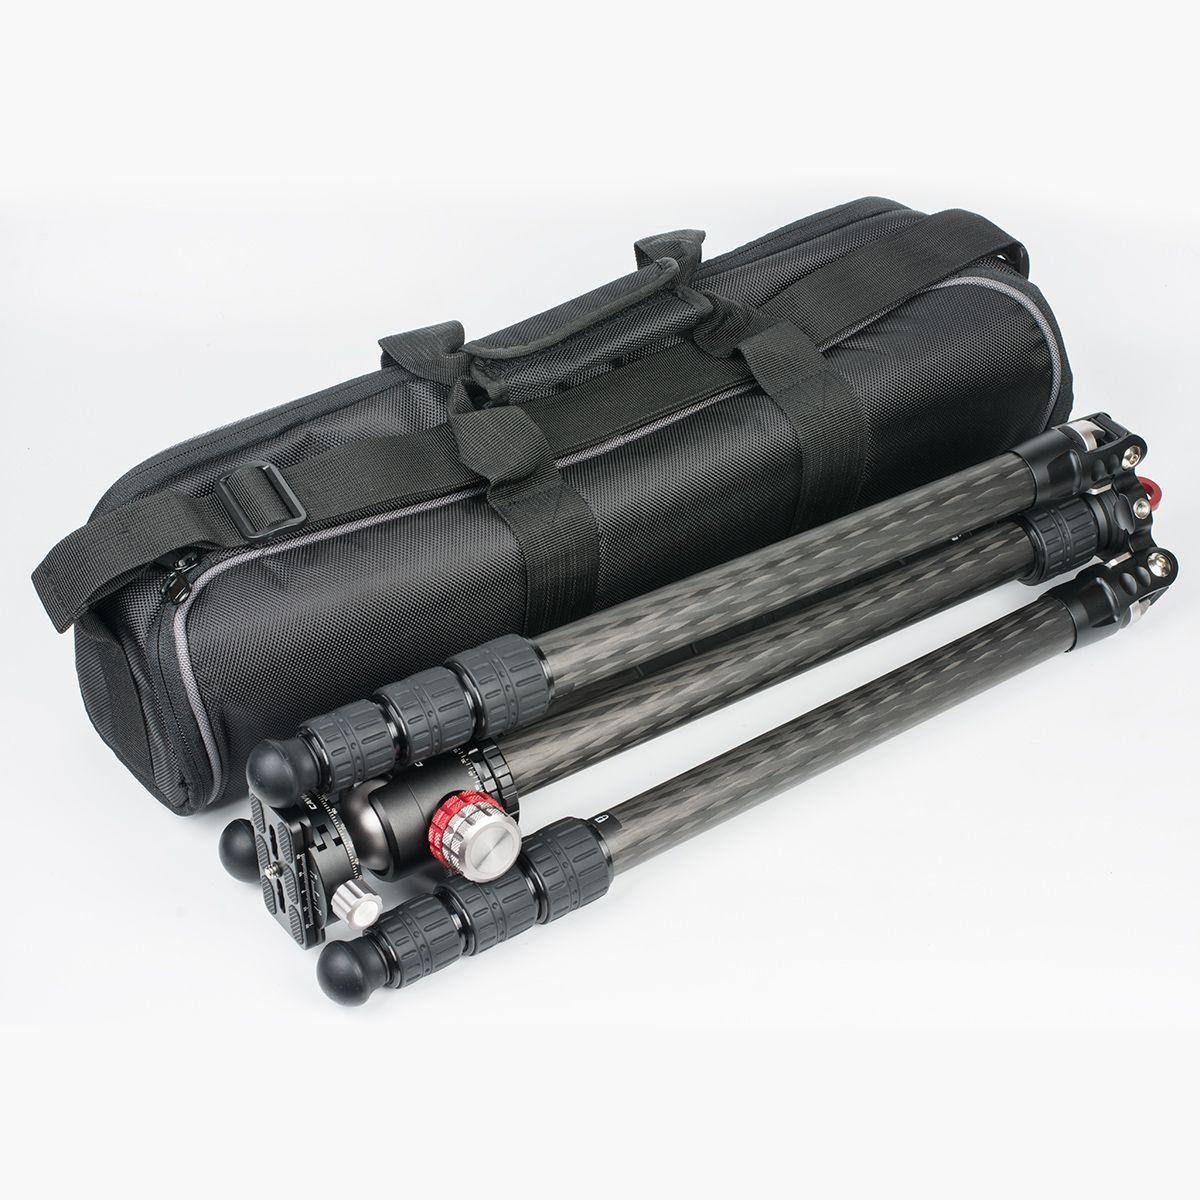 Travelling carbon fiber tripod